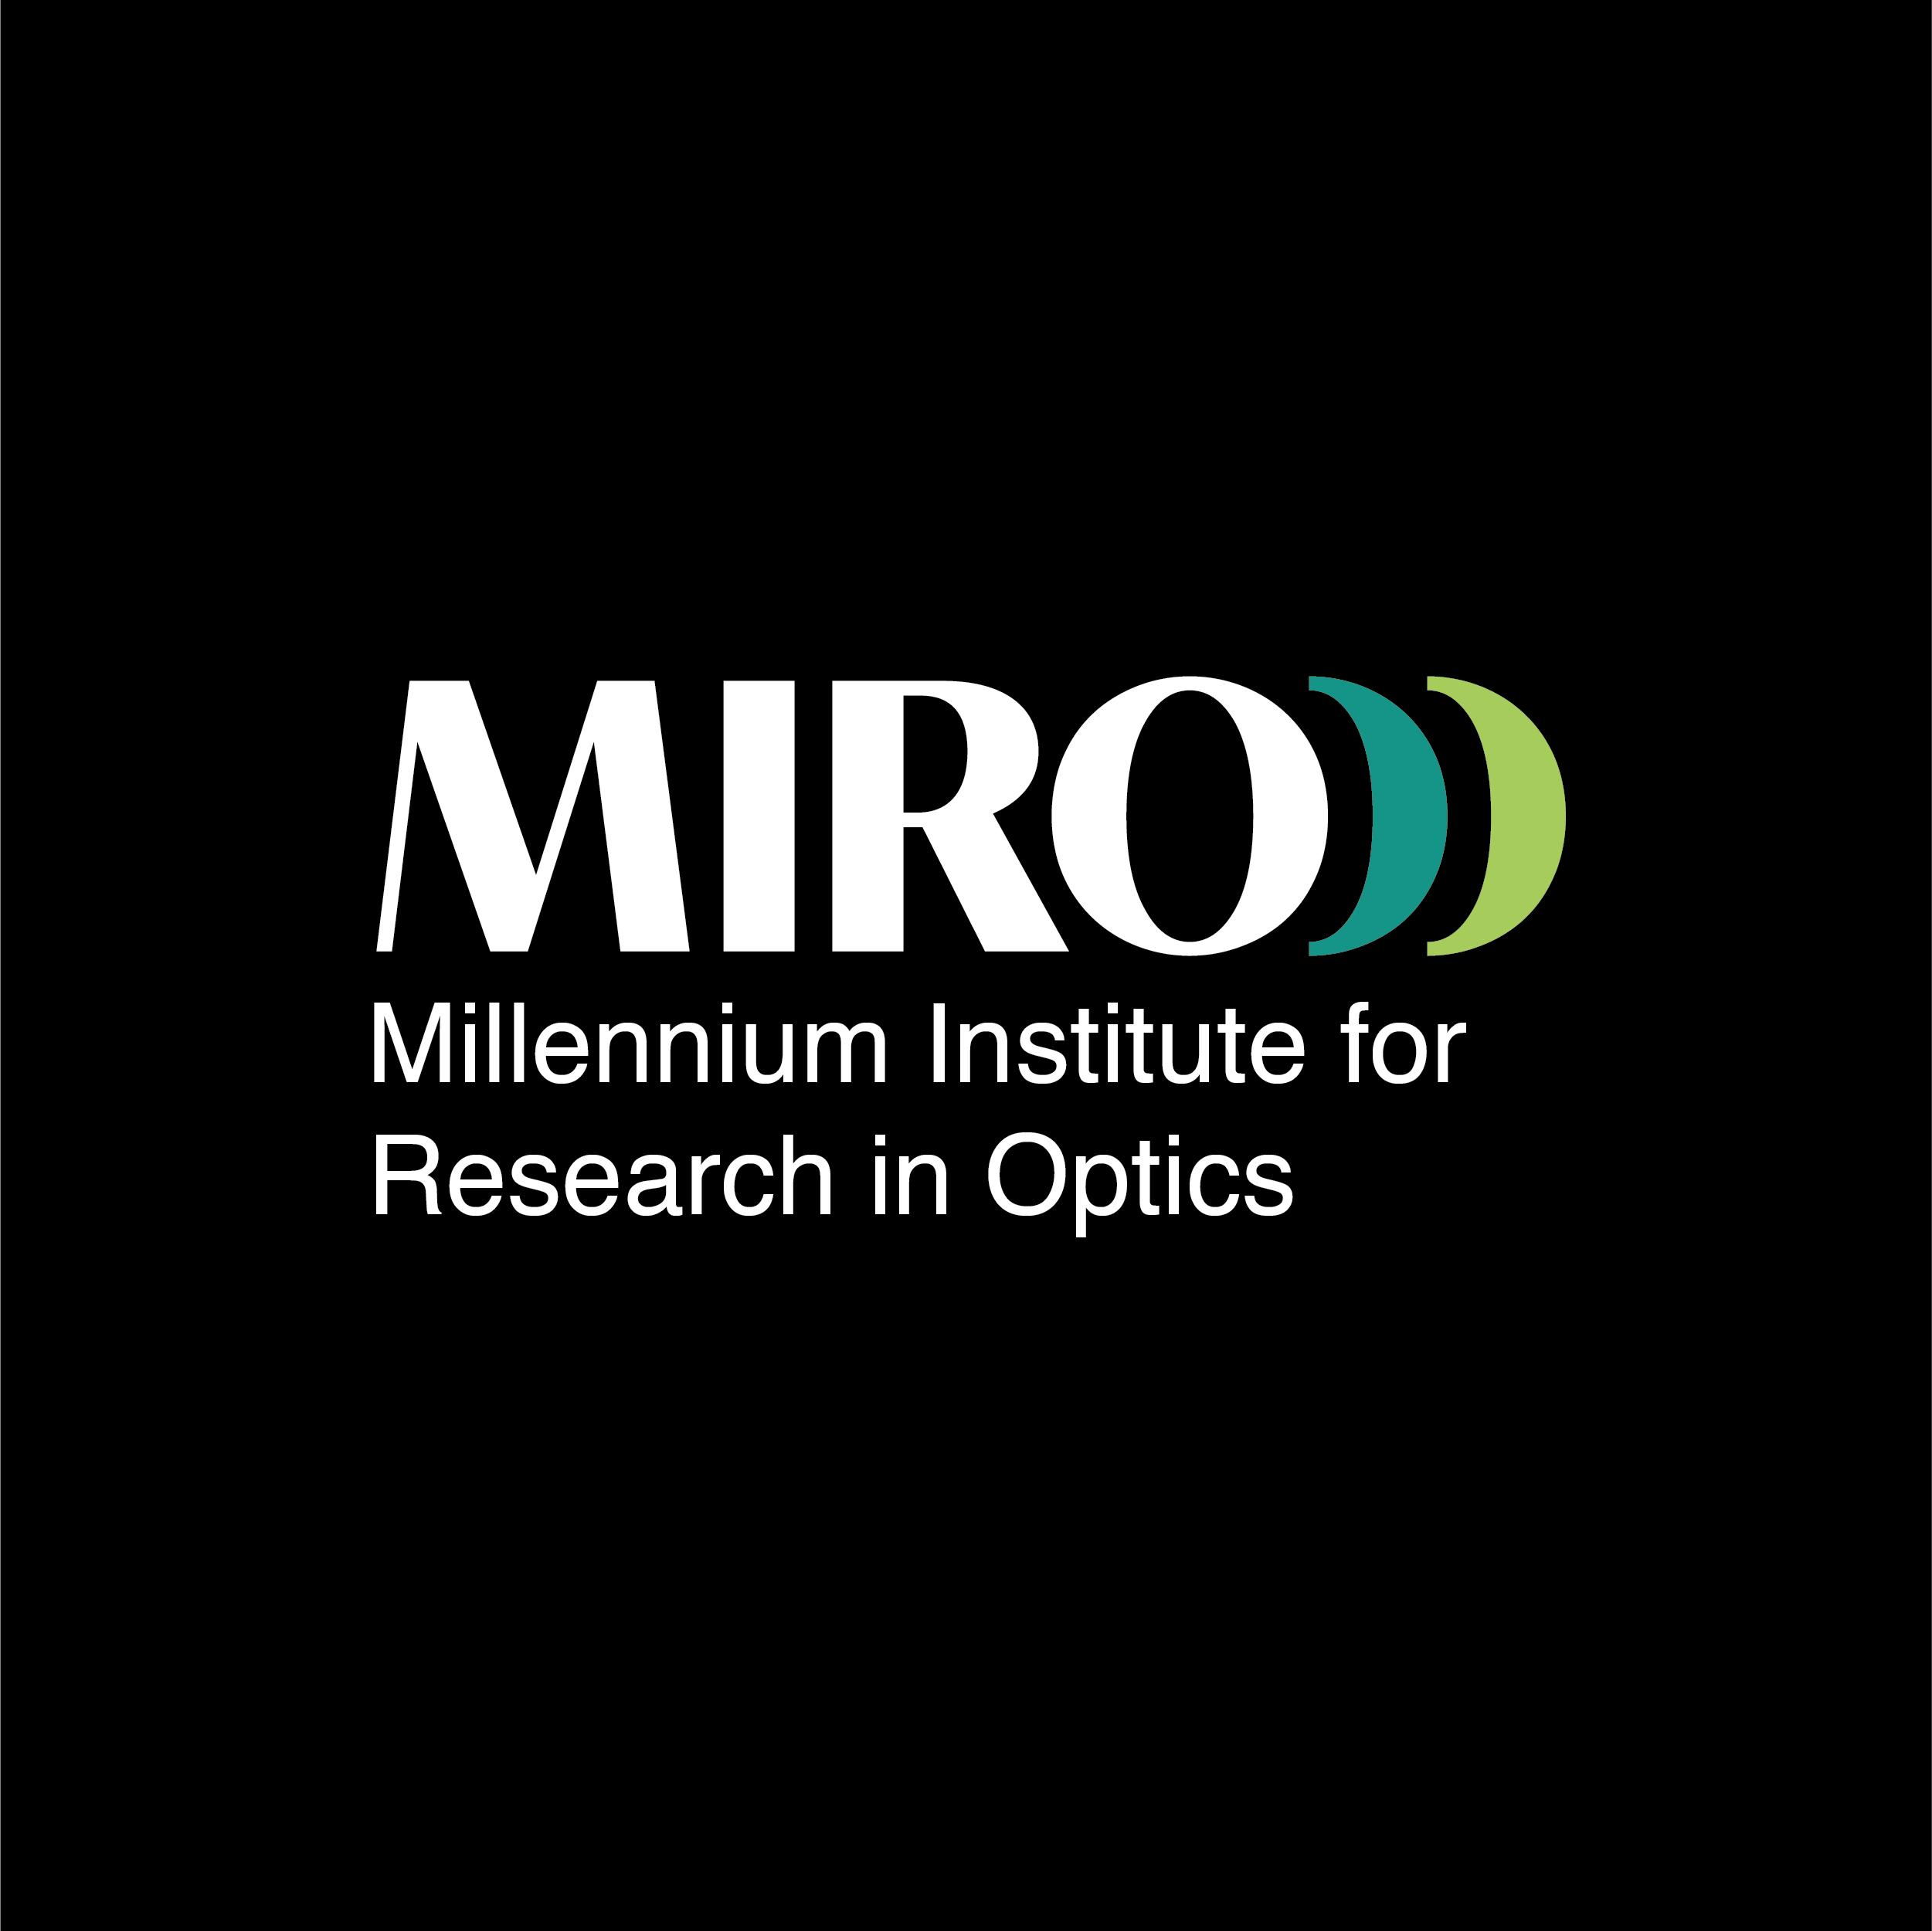 Logo-MIRO-Daniel-Cavalcanti